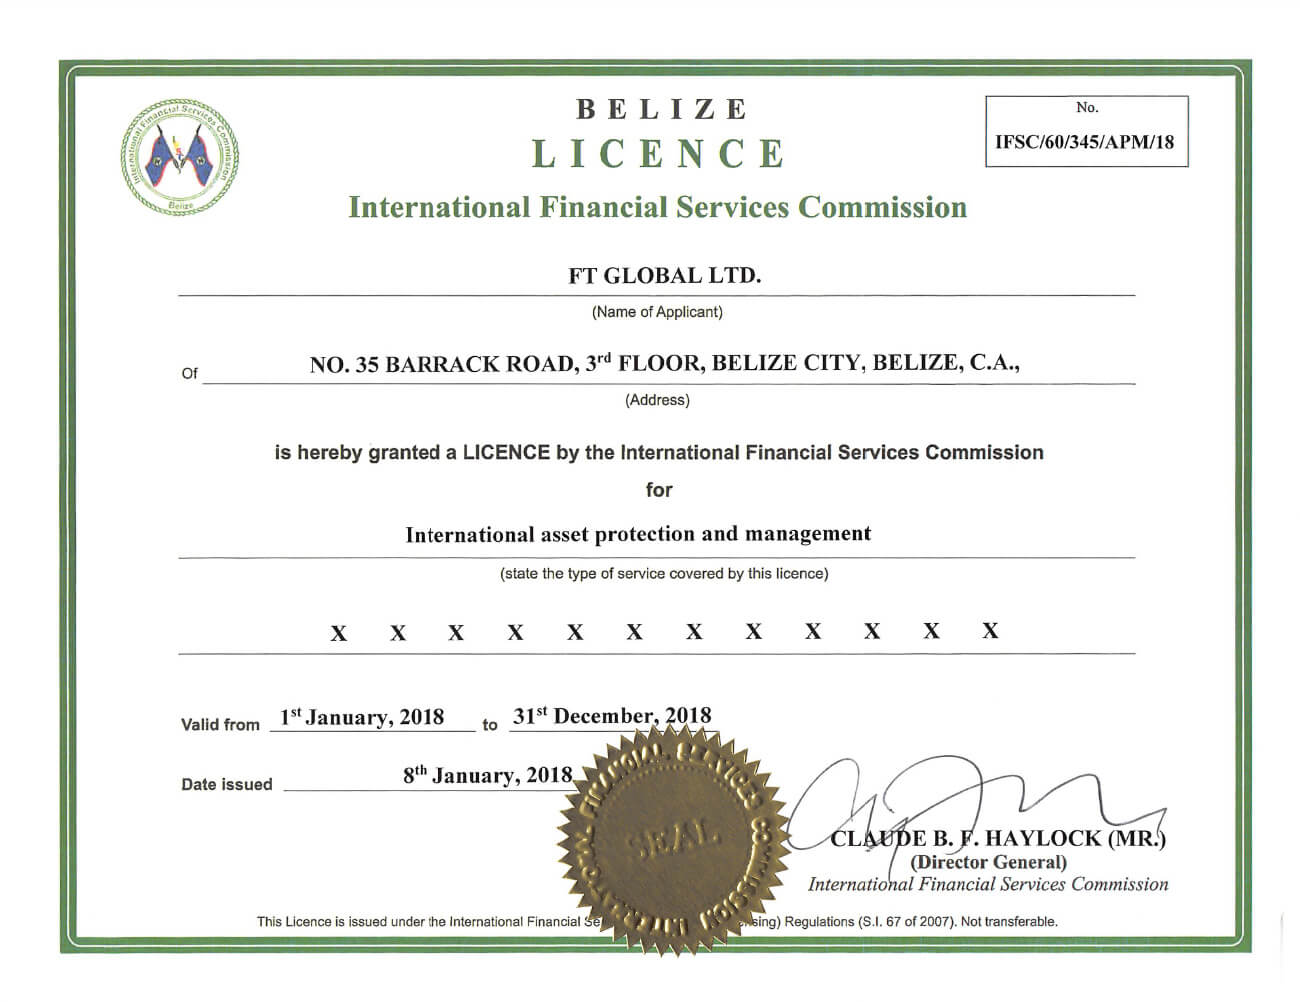 IFSC License